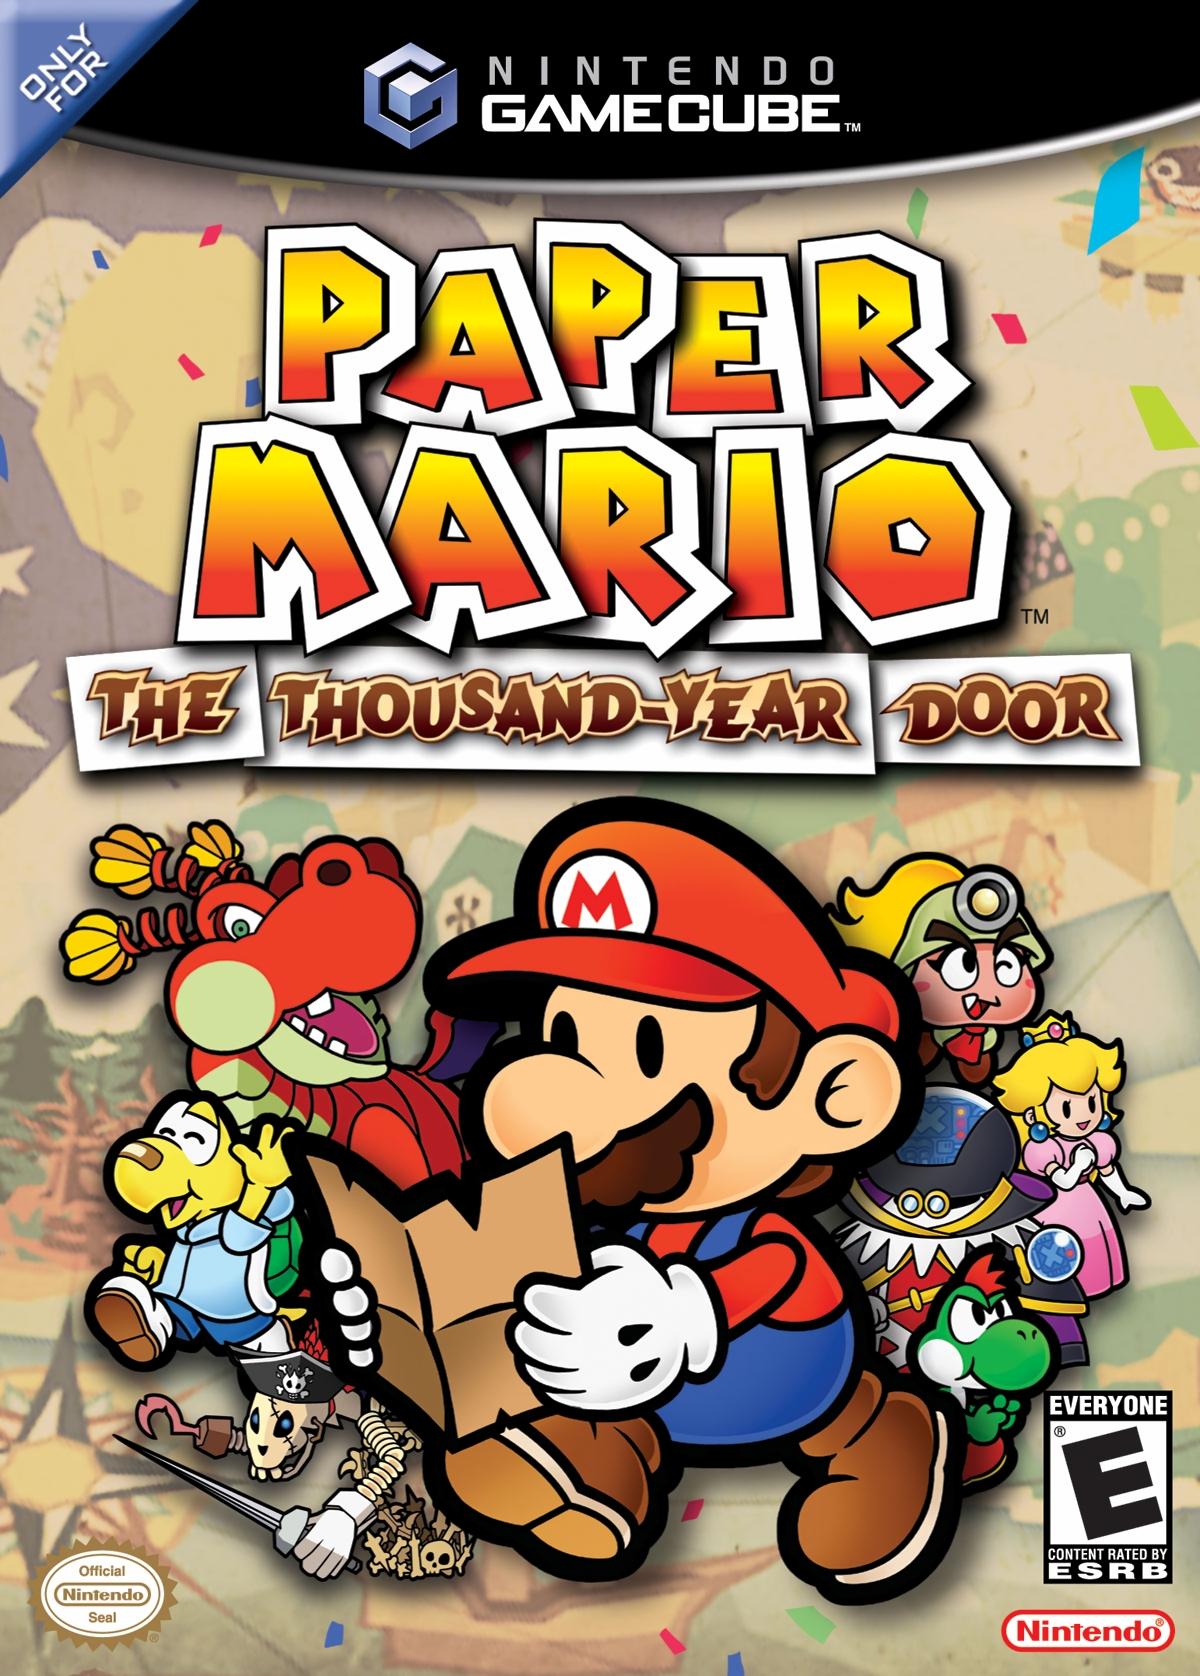 Paper Mario The Thousand-Year Door/GameCube